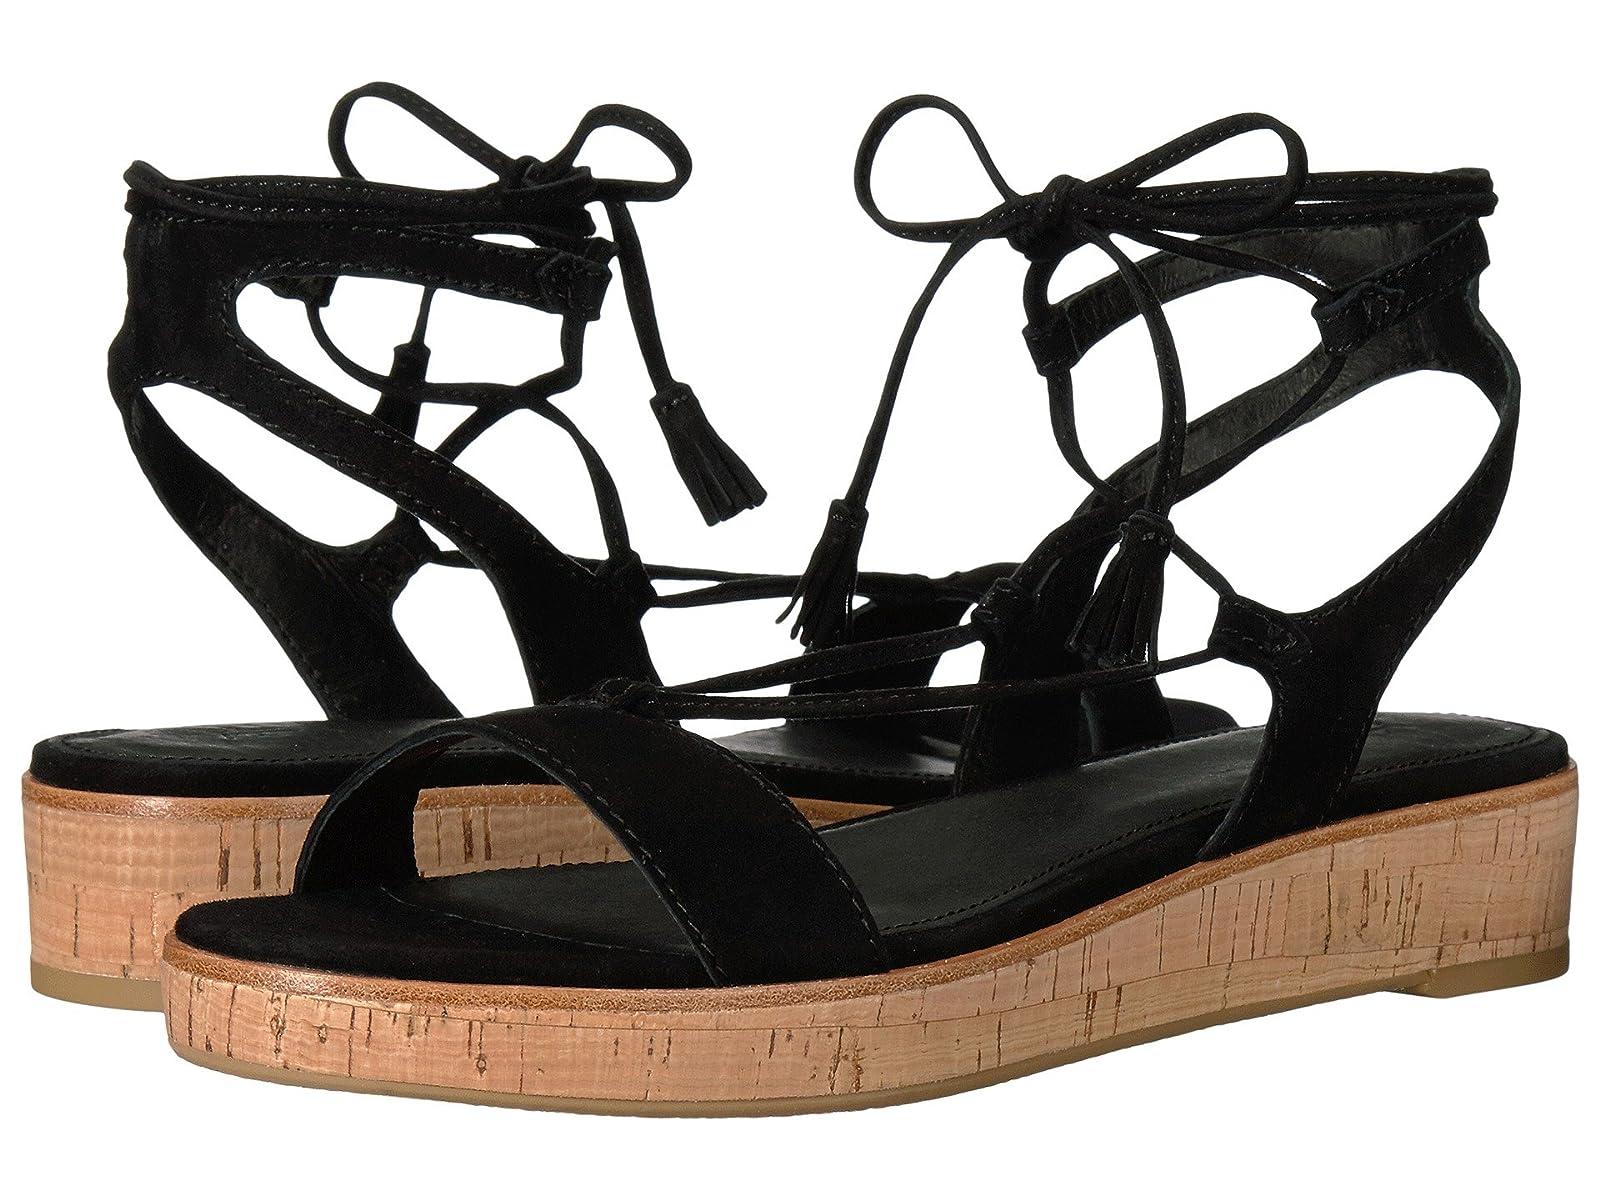 Frye Miranda GladiatorCheap and distinctive eye-catching shoes